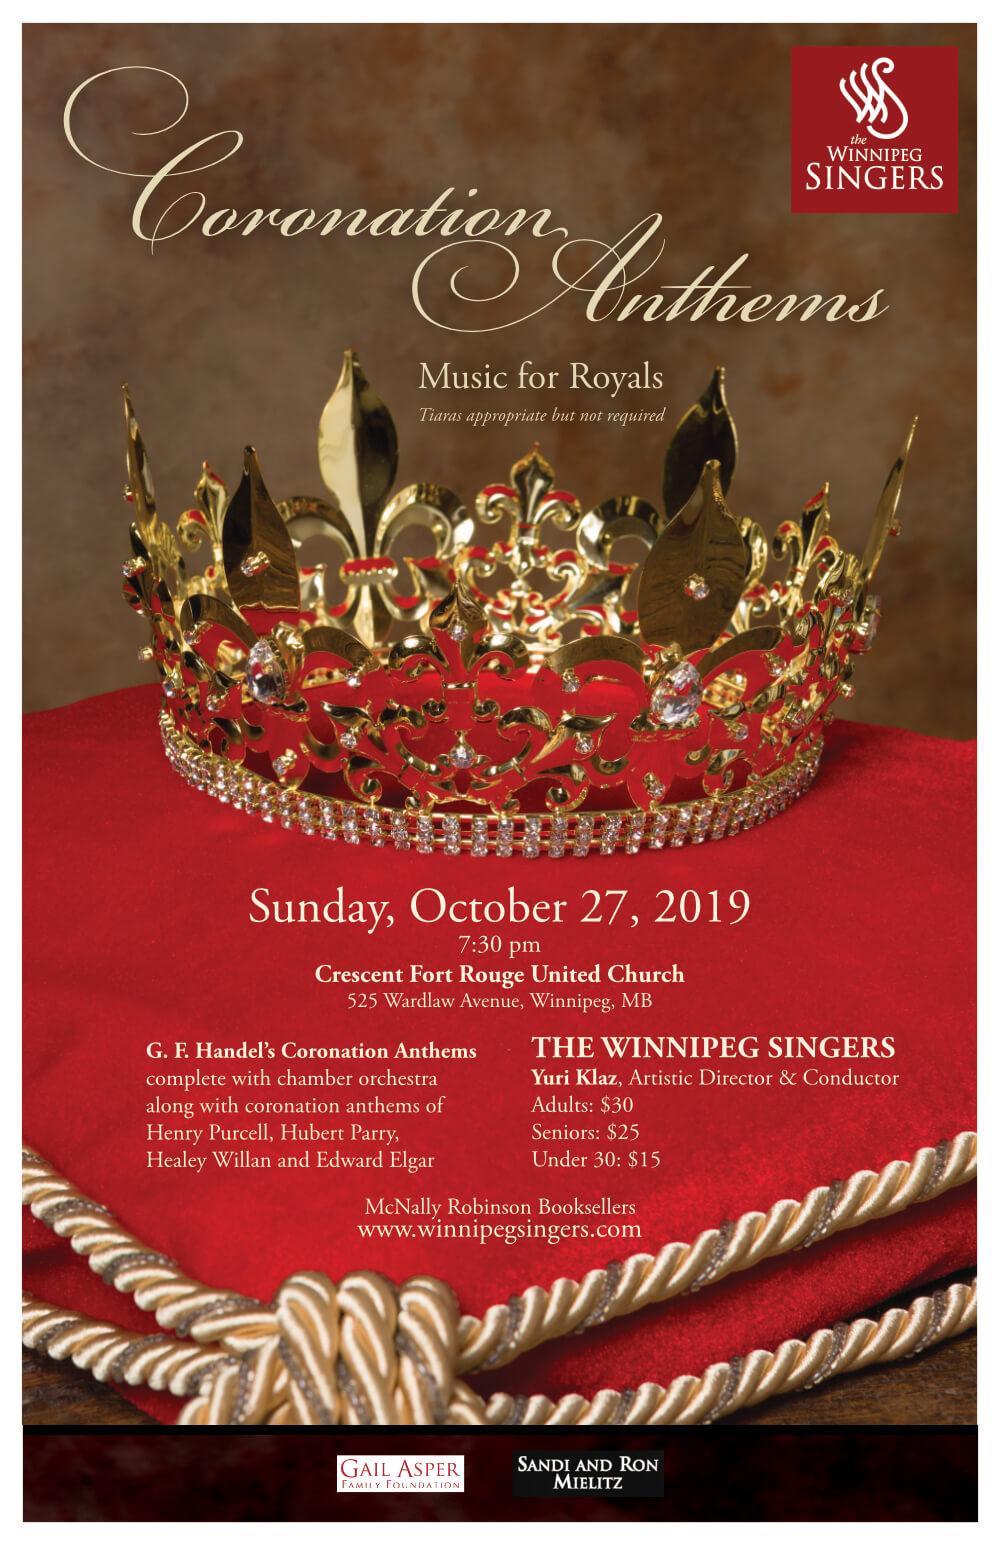 Winnipeg Singers, Concert 1: Coronation Anthems, poster